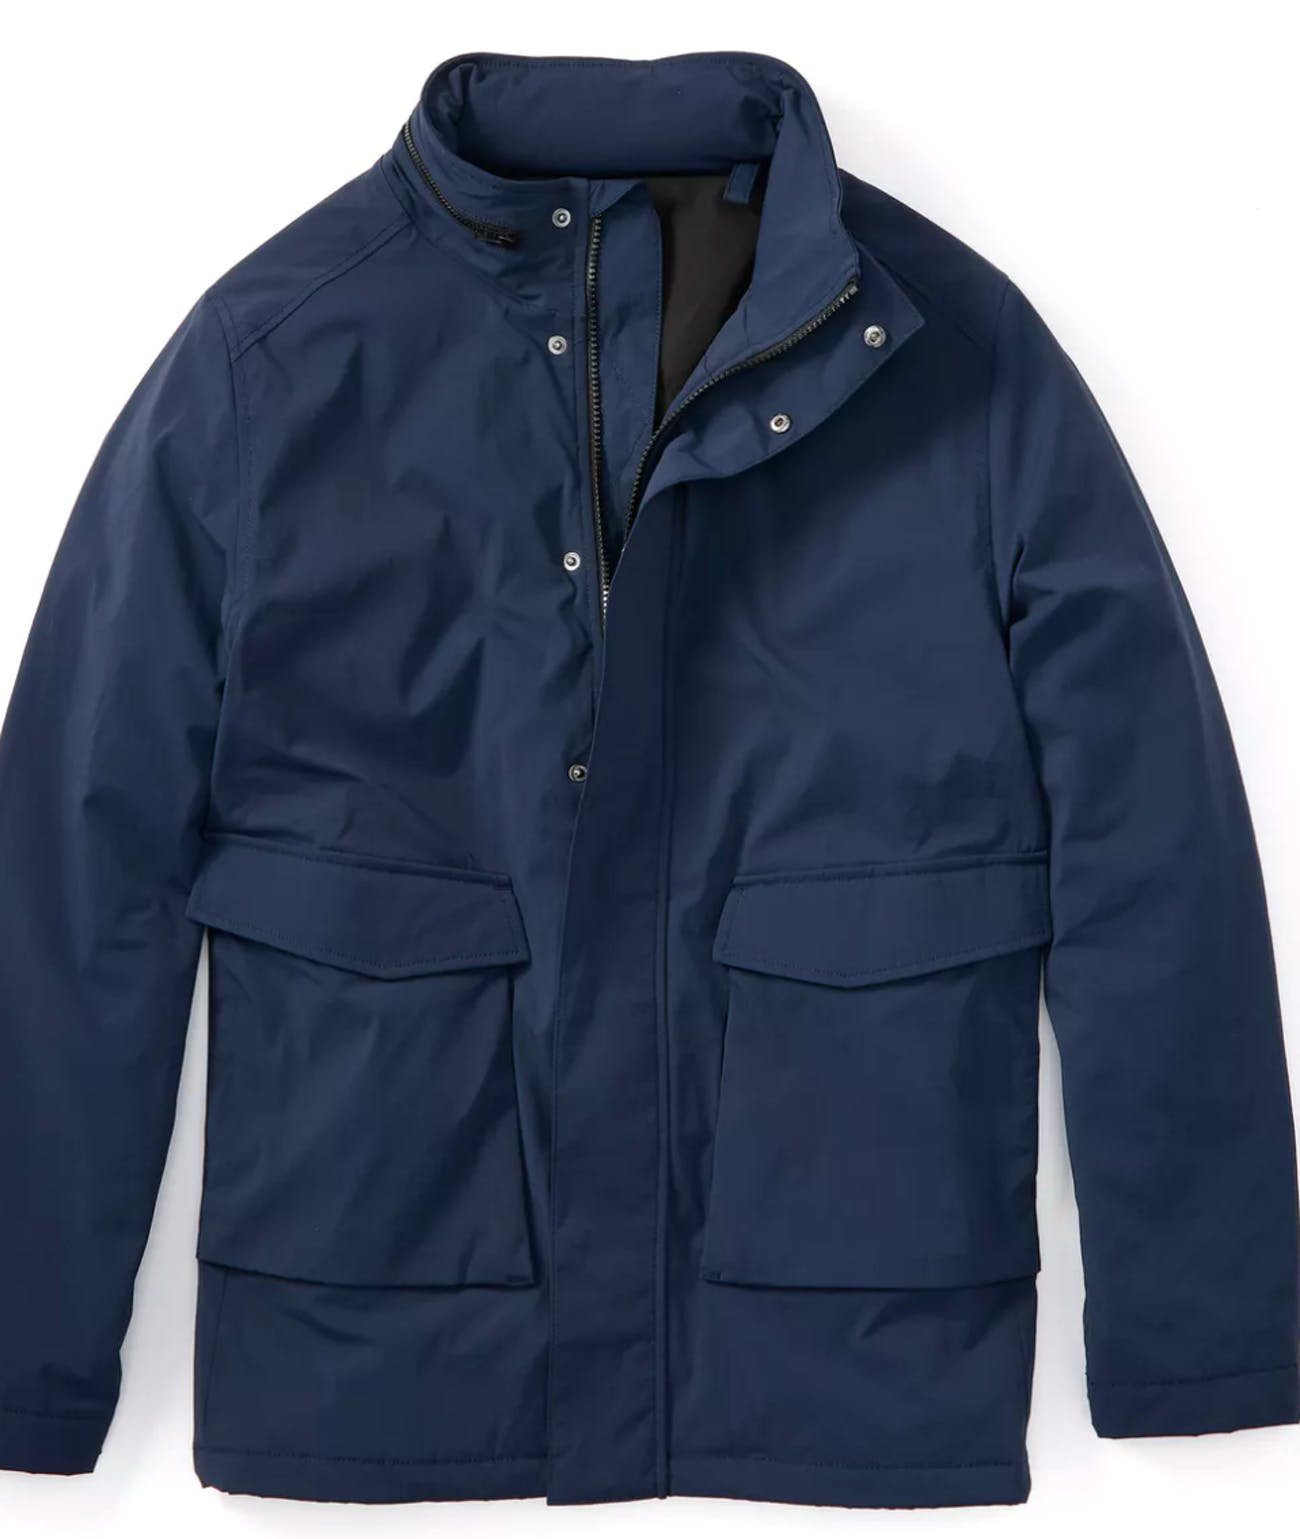 winter jackets best jackets military jackets